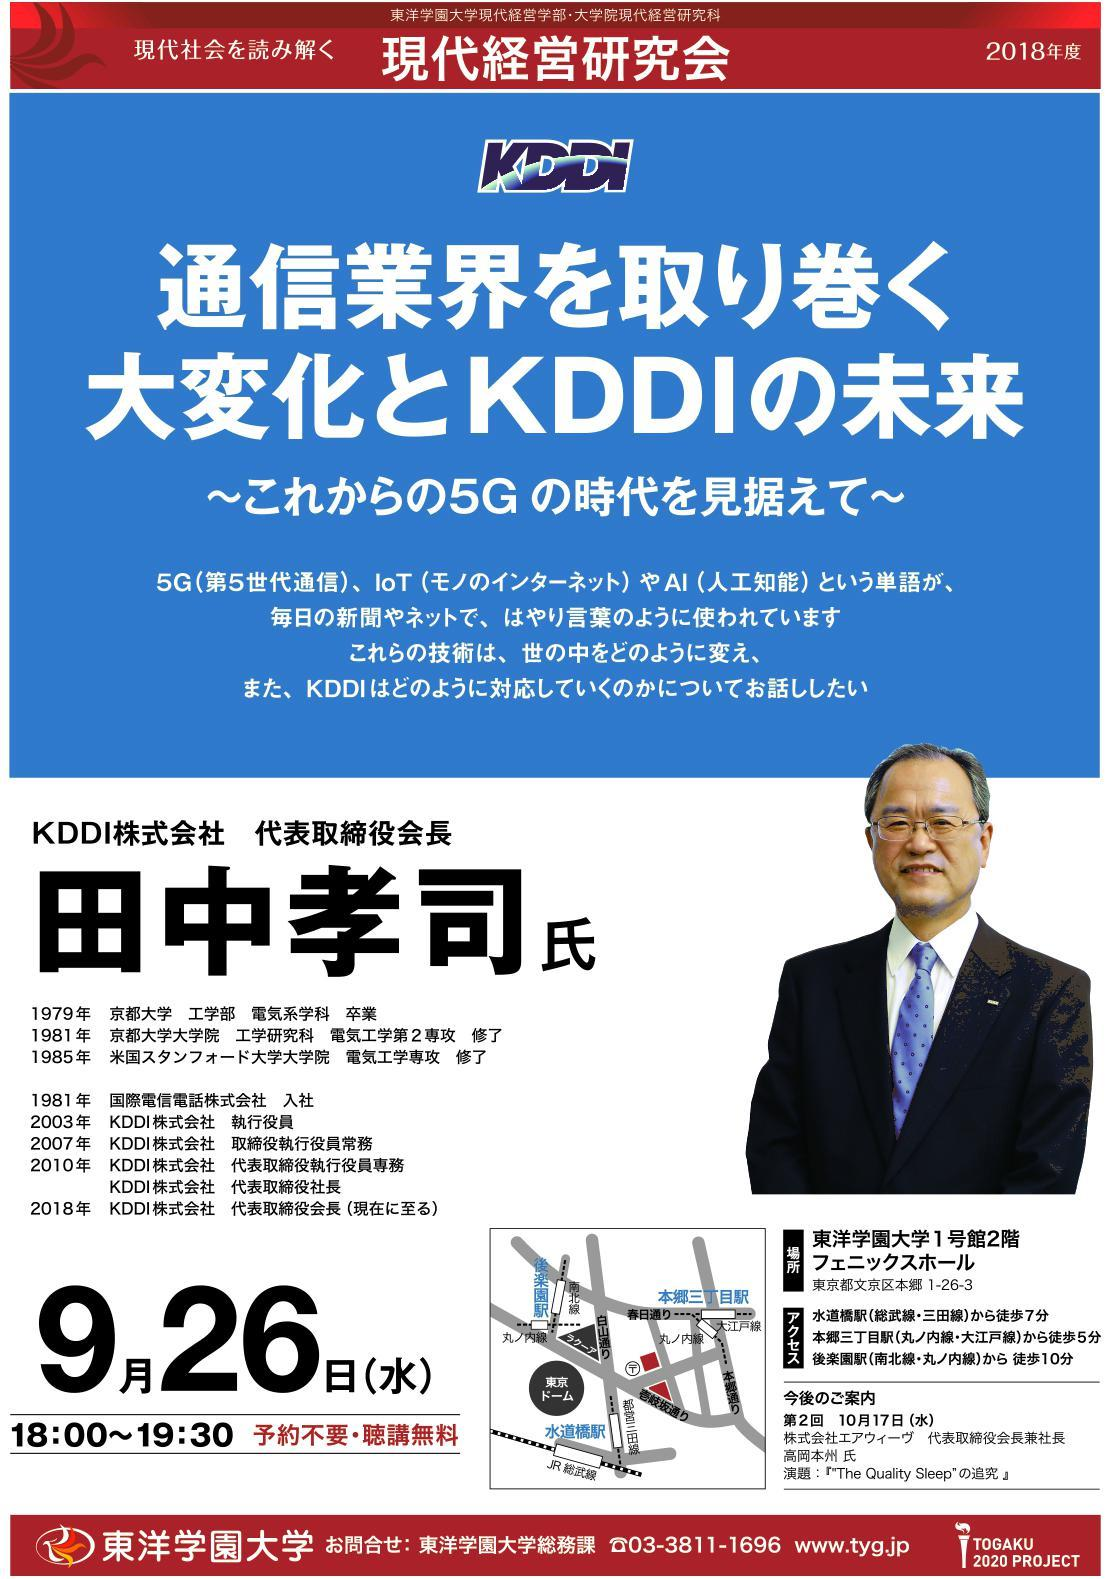 KDDIや星野リゾートなど、第一線で活躍する現役経営者が経営課題を語る -- 東洋学園大学・大学院共催の「現代経営研究会」が9月26日(水)よりスタート(予約不要・聴講無料)